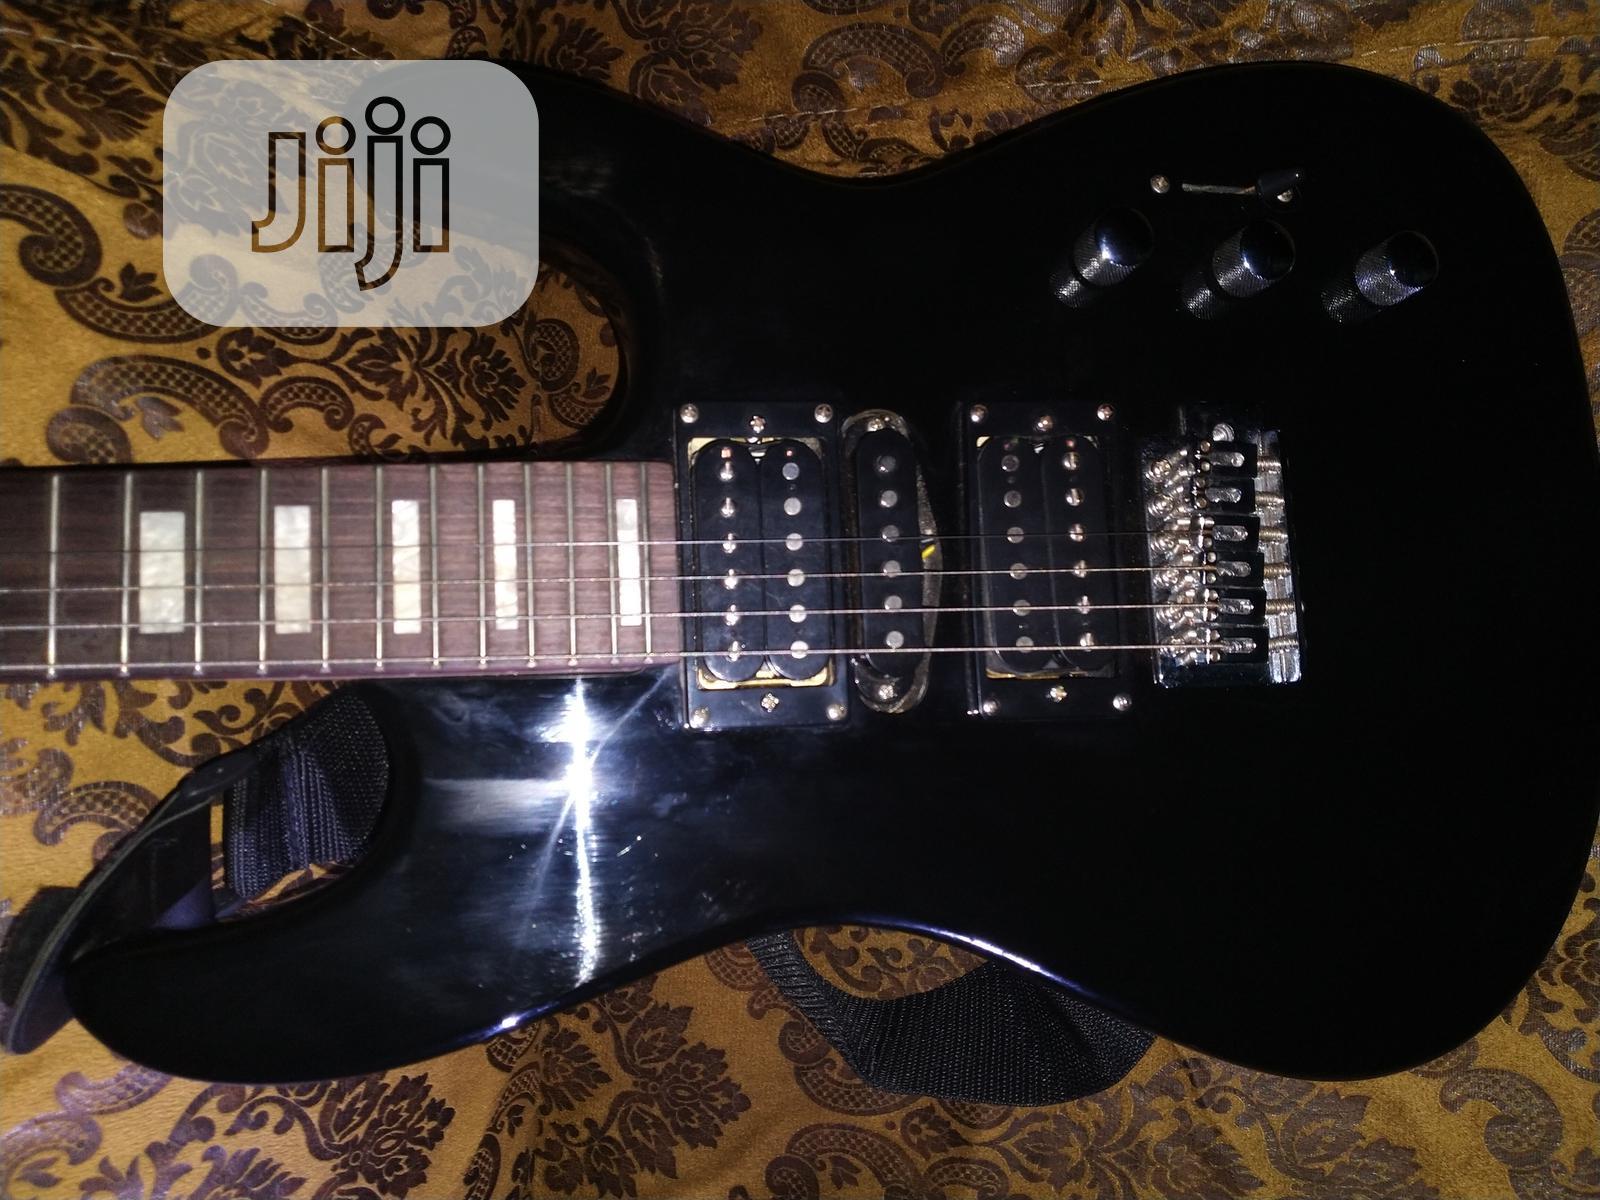 Archive: Condor Lead Guitar